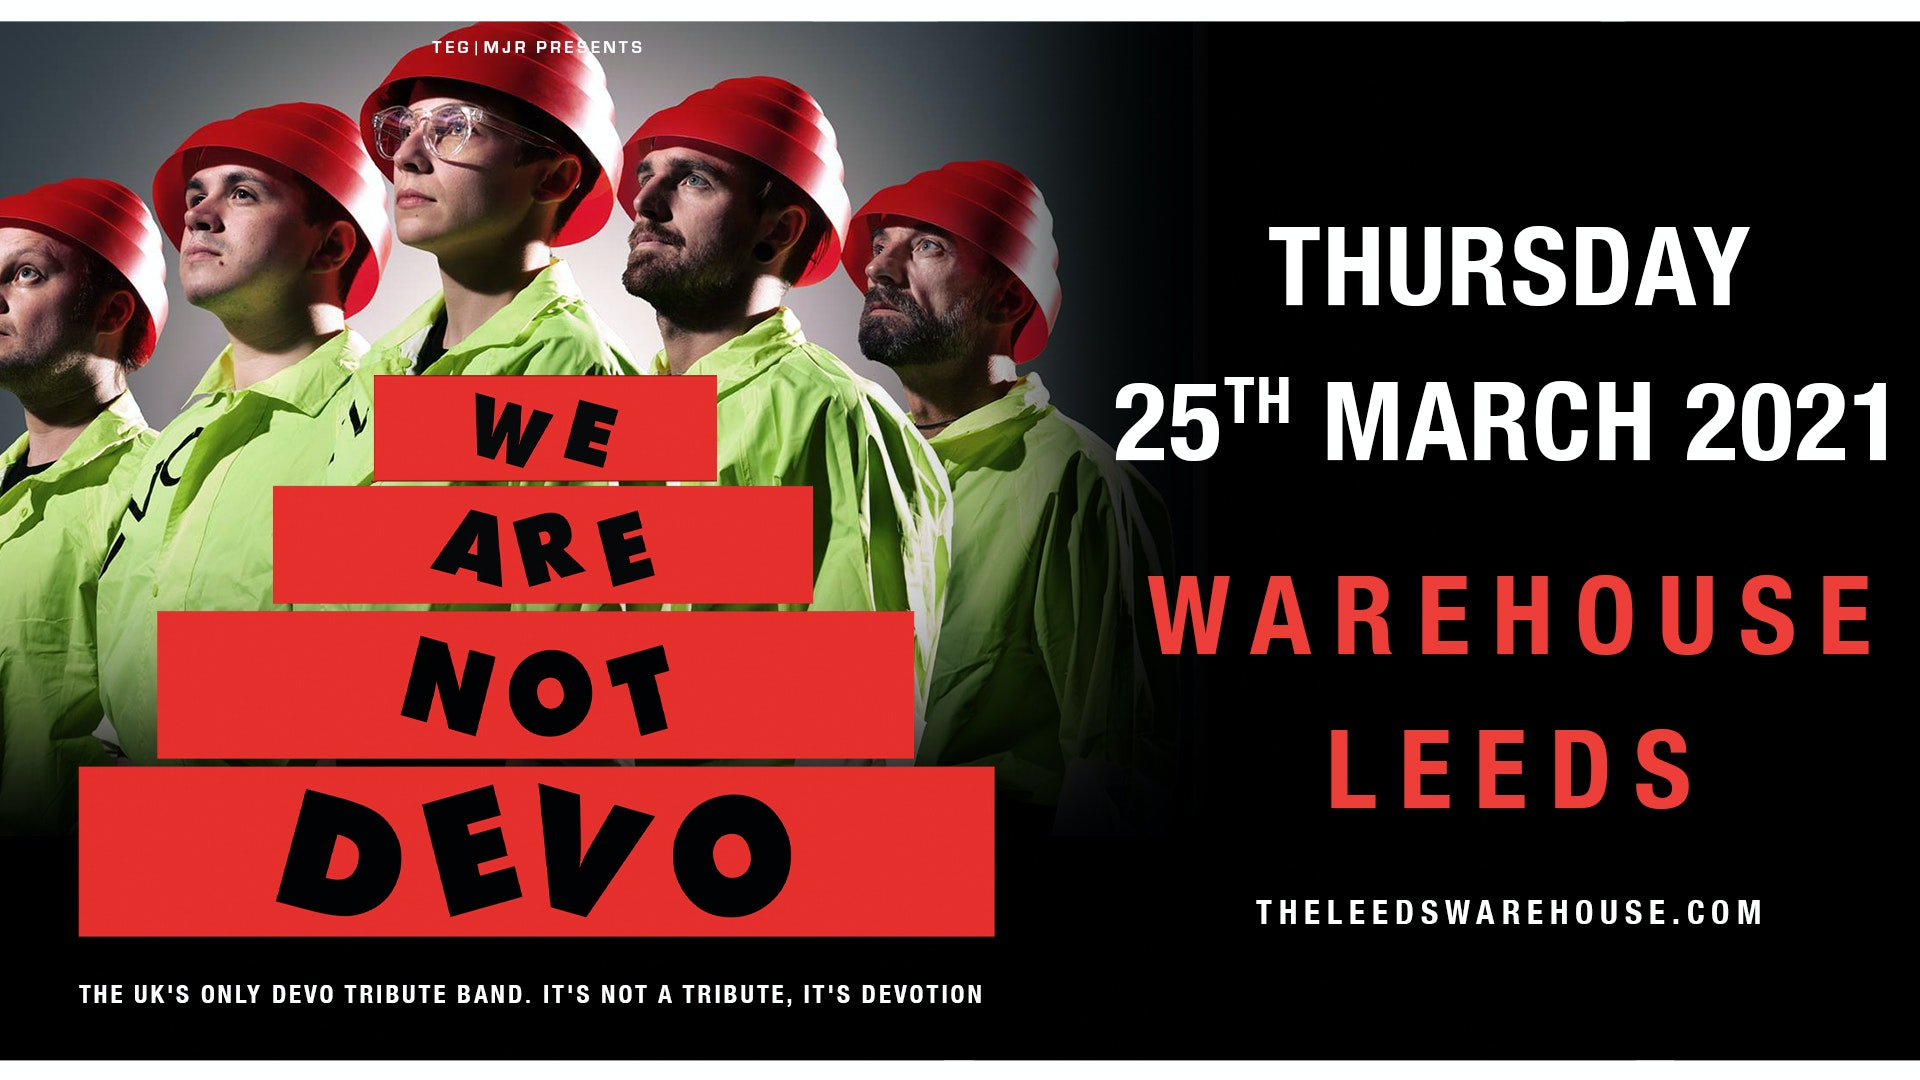 We are not DEVO – Live